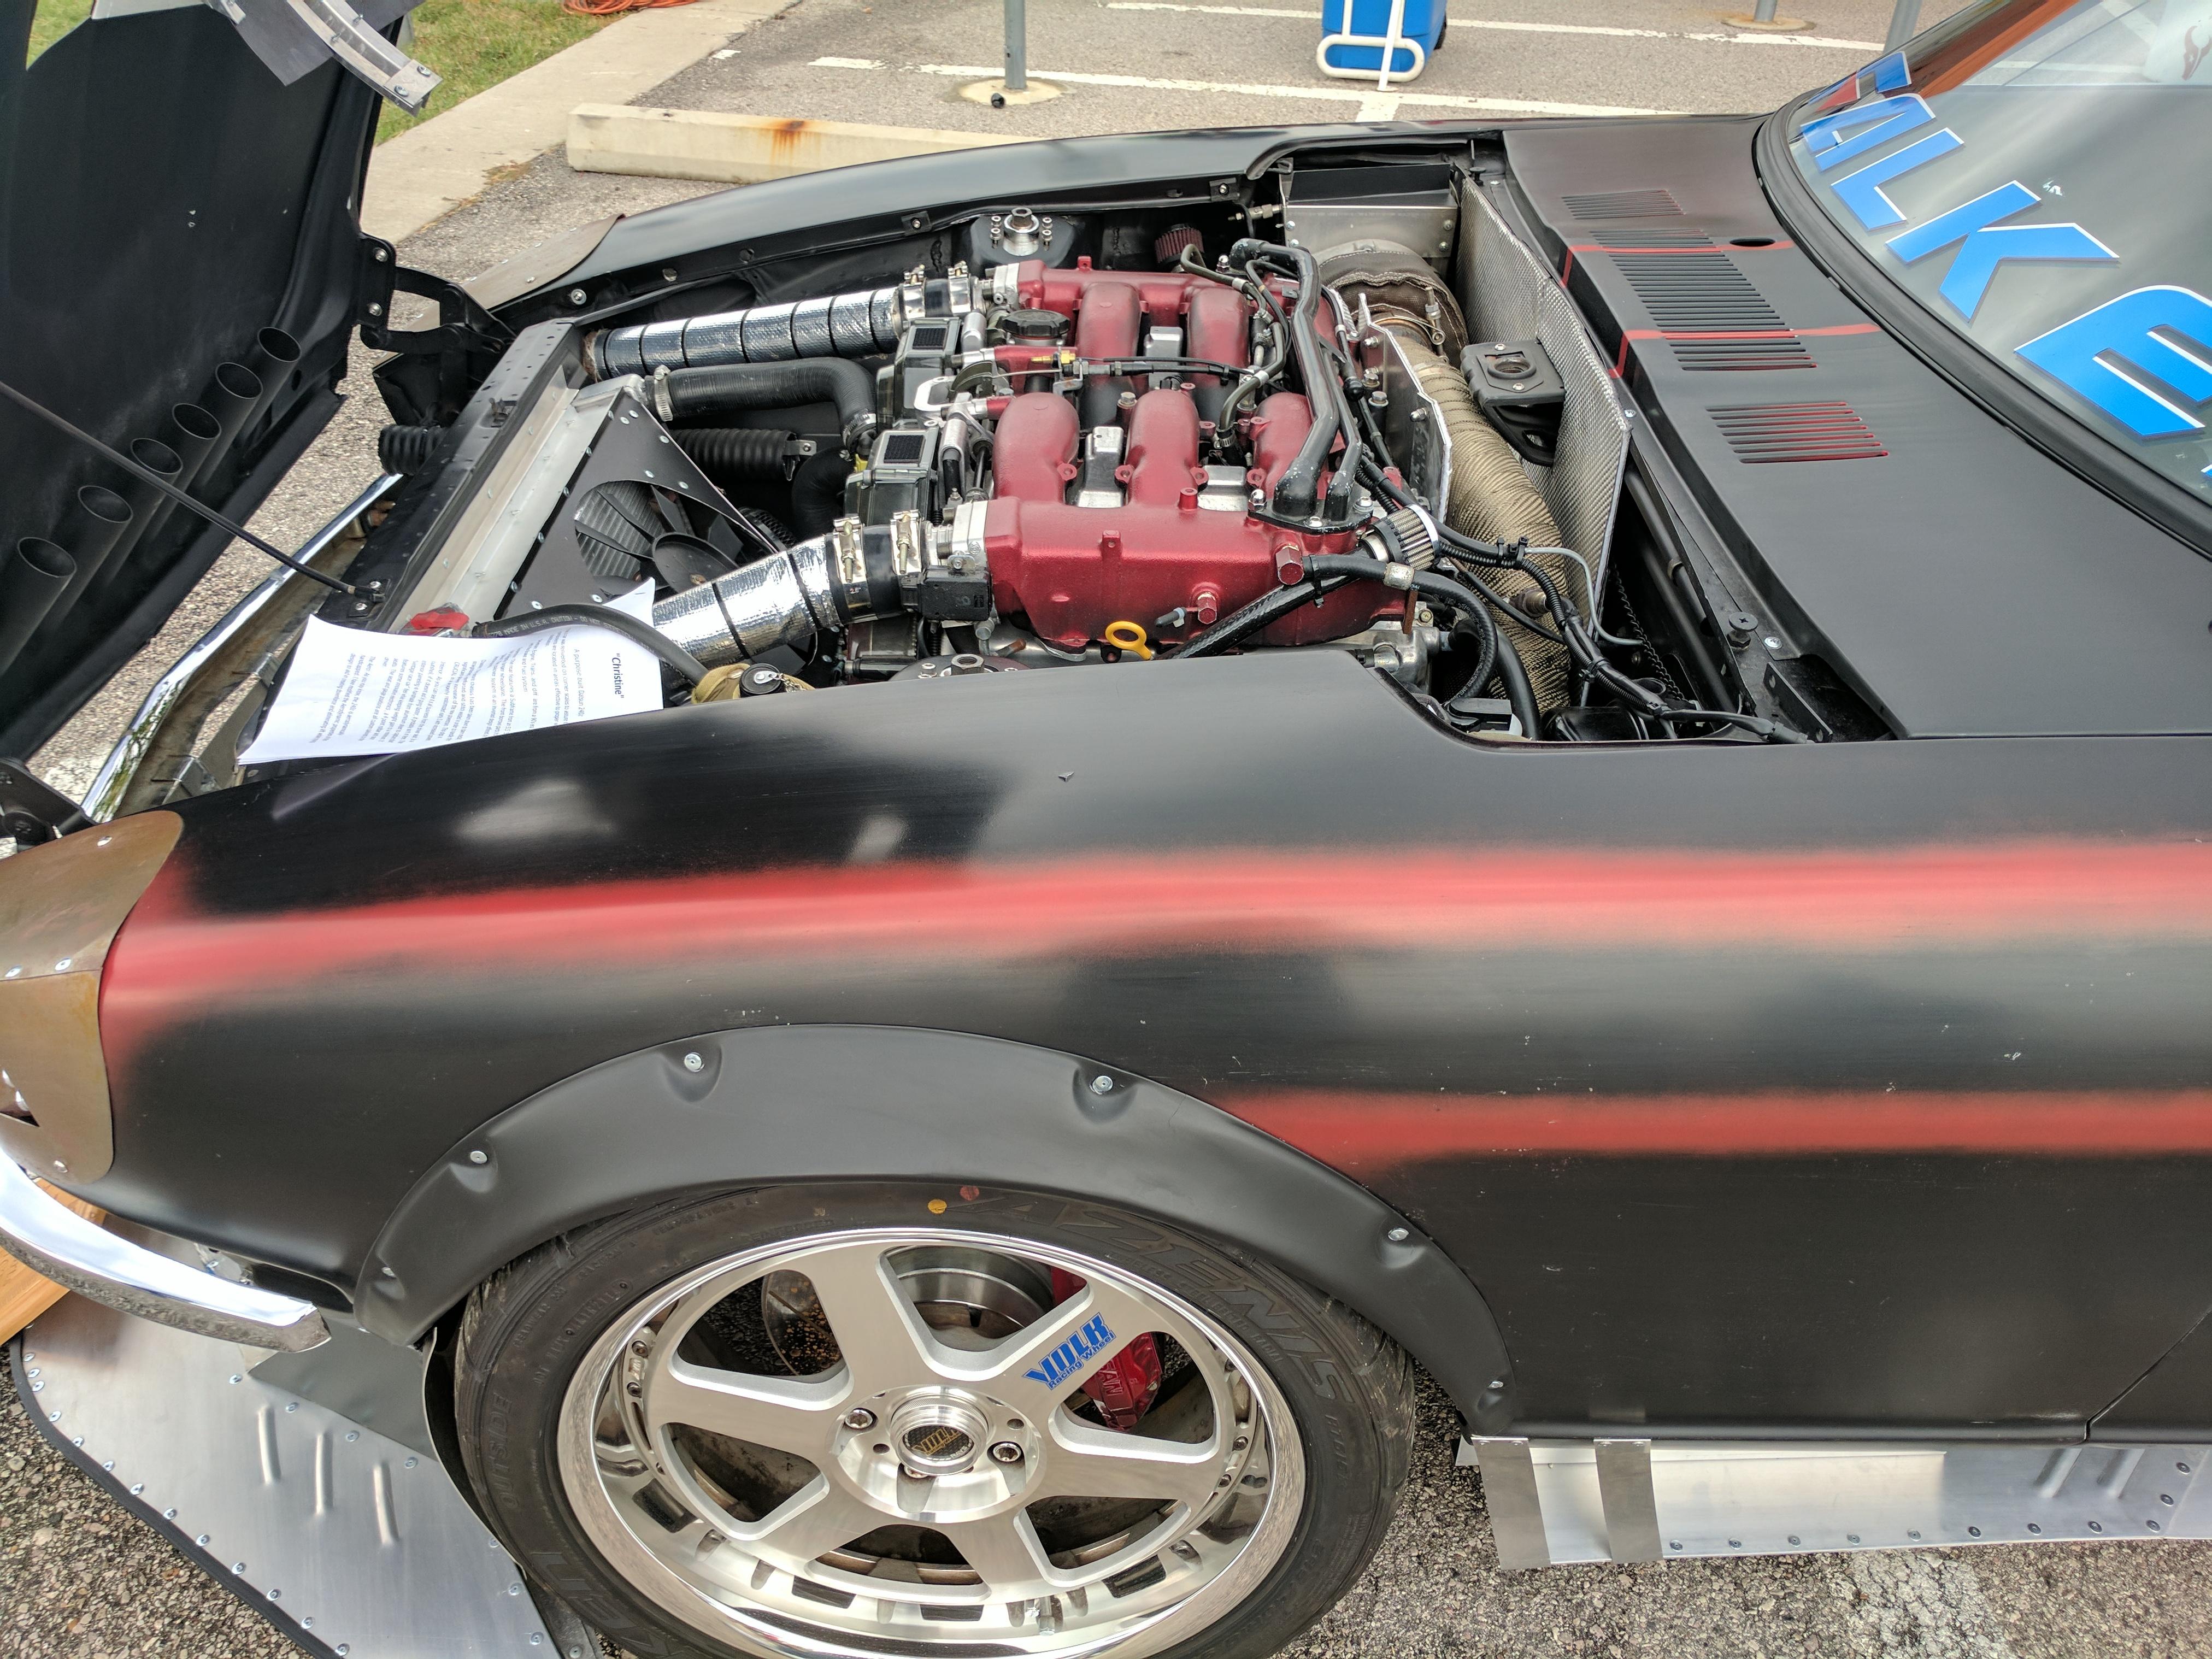 VG30DETT in an S30